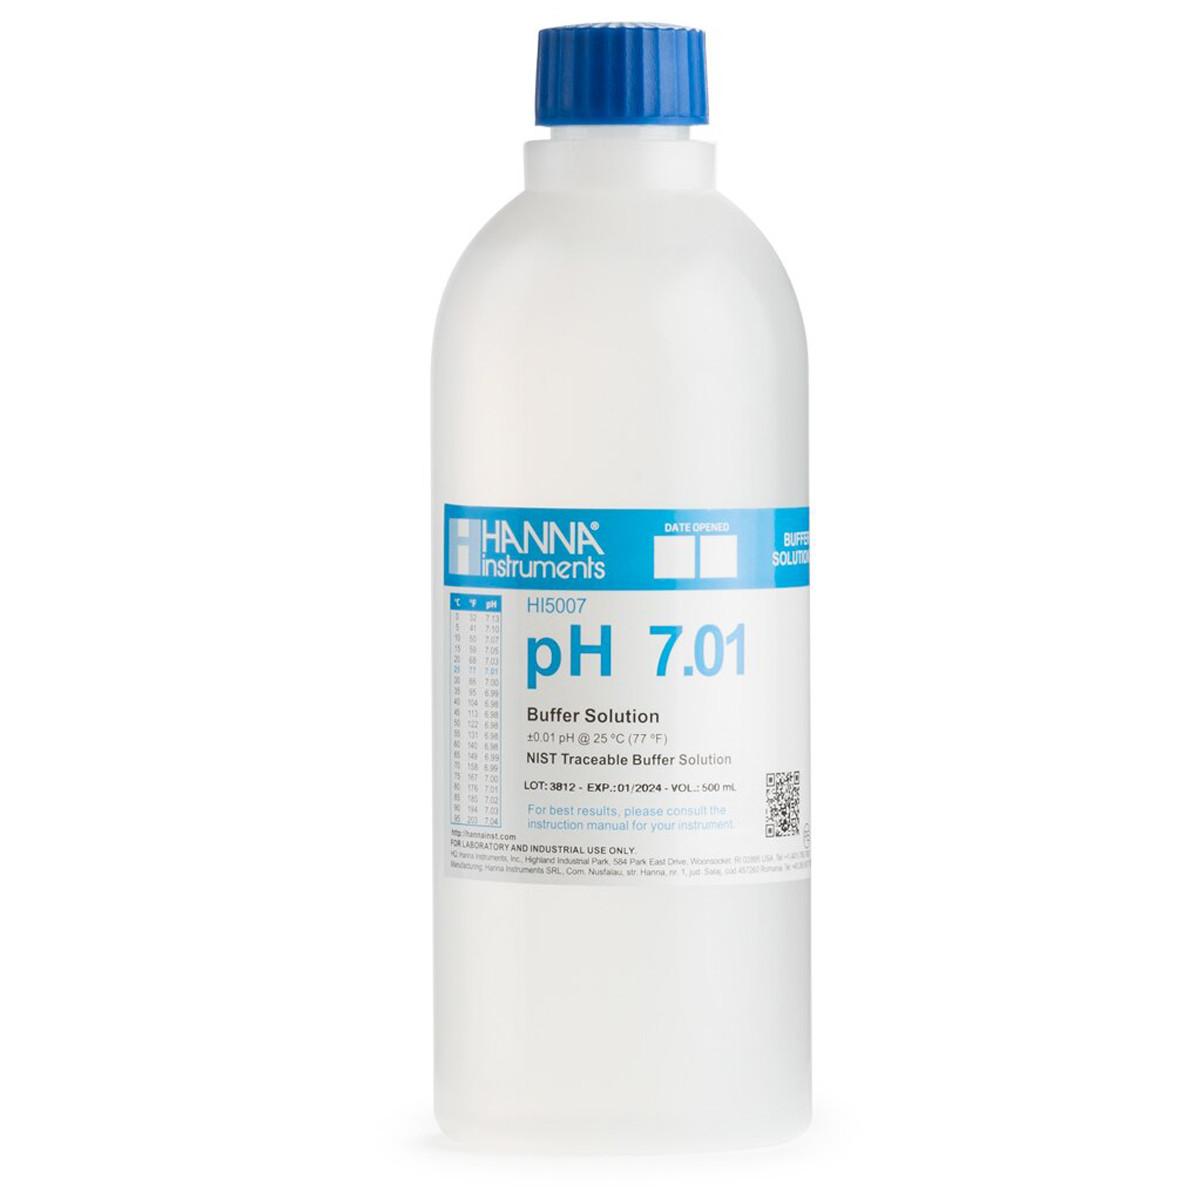 pH 7.01 Technical Calibration Buffer (500 mL)